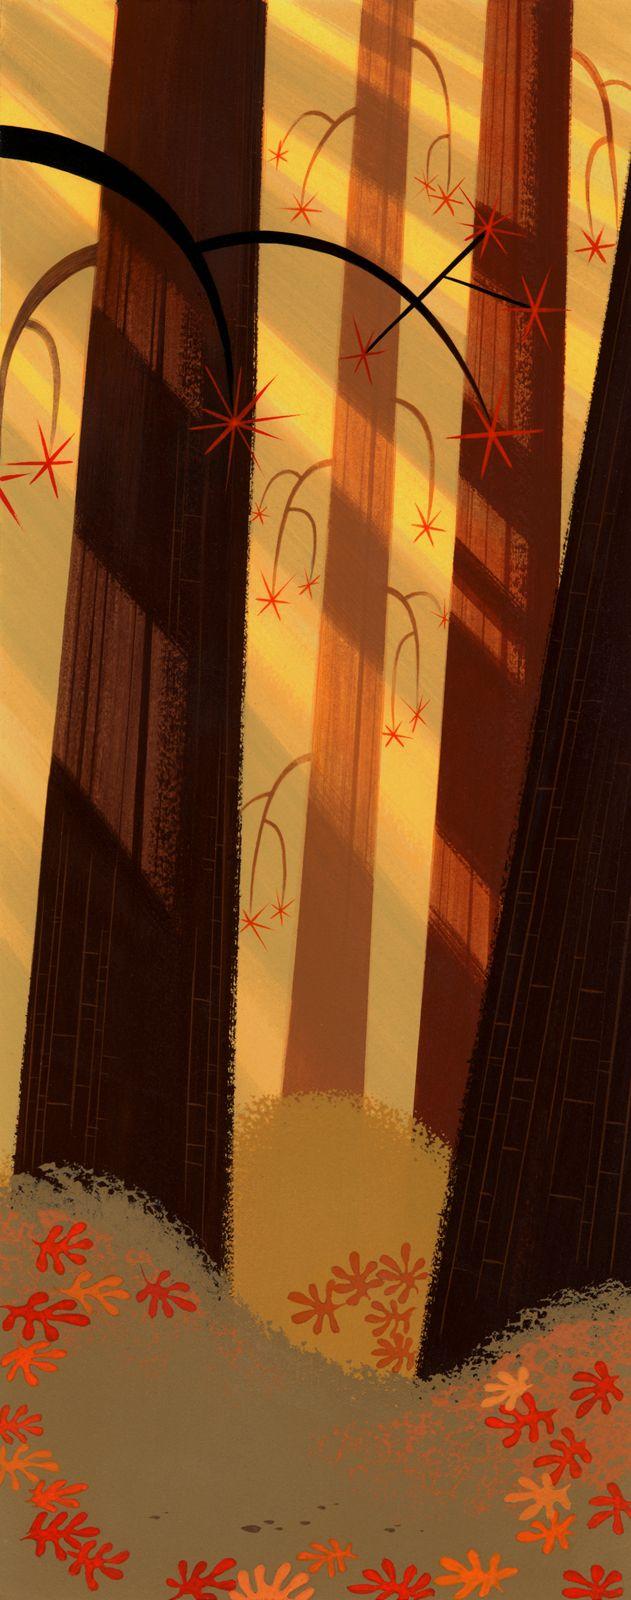 Samurai Jack background art painted by Scott Wills. 2001.